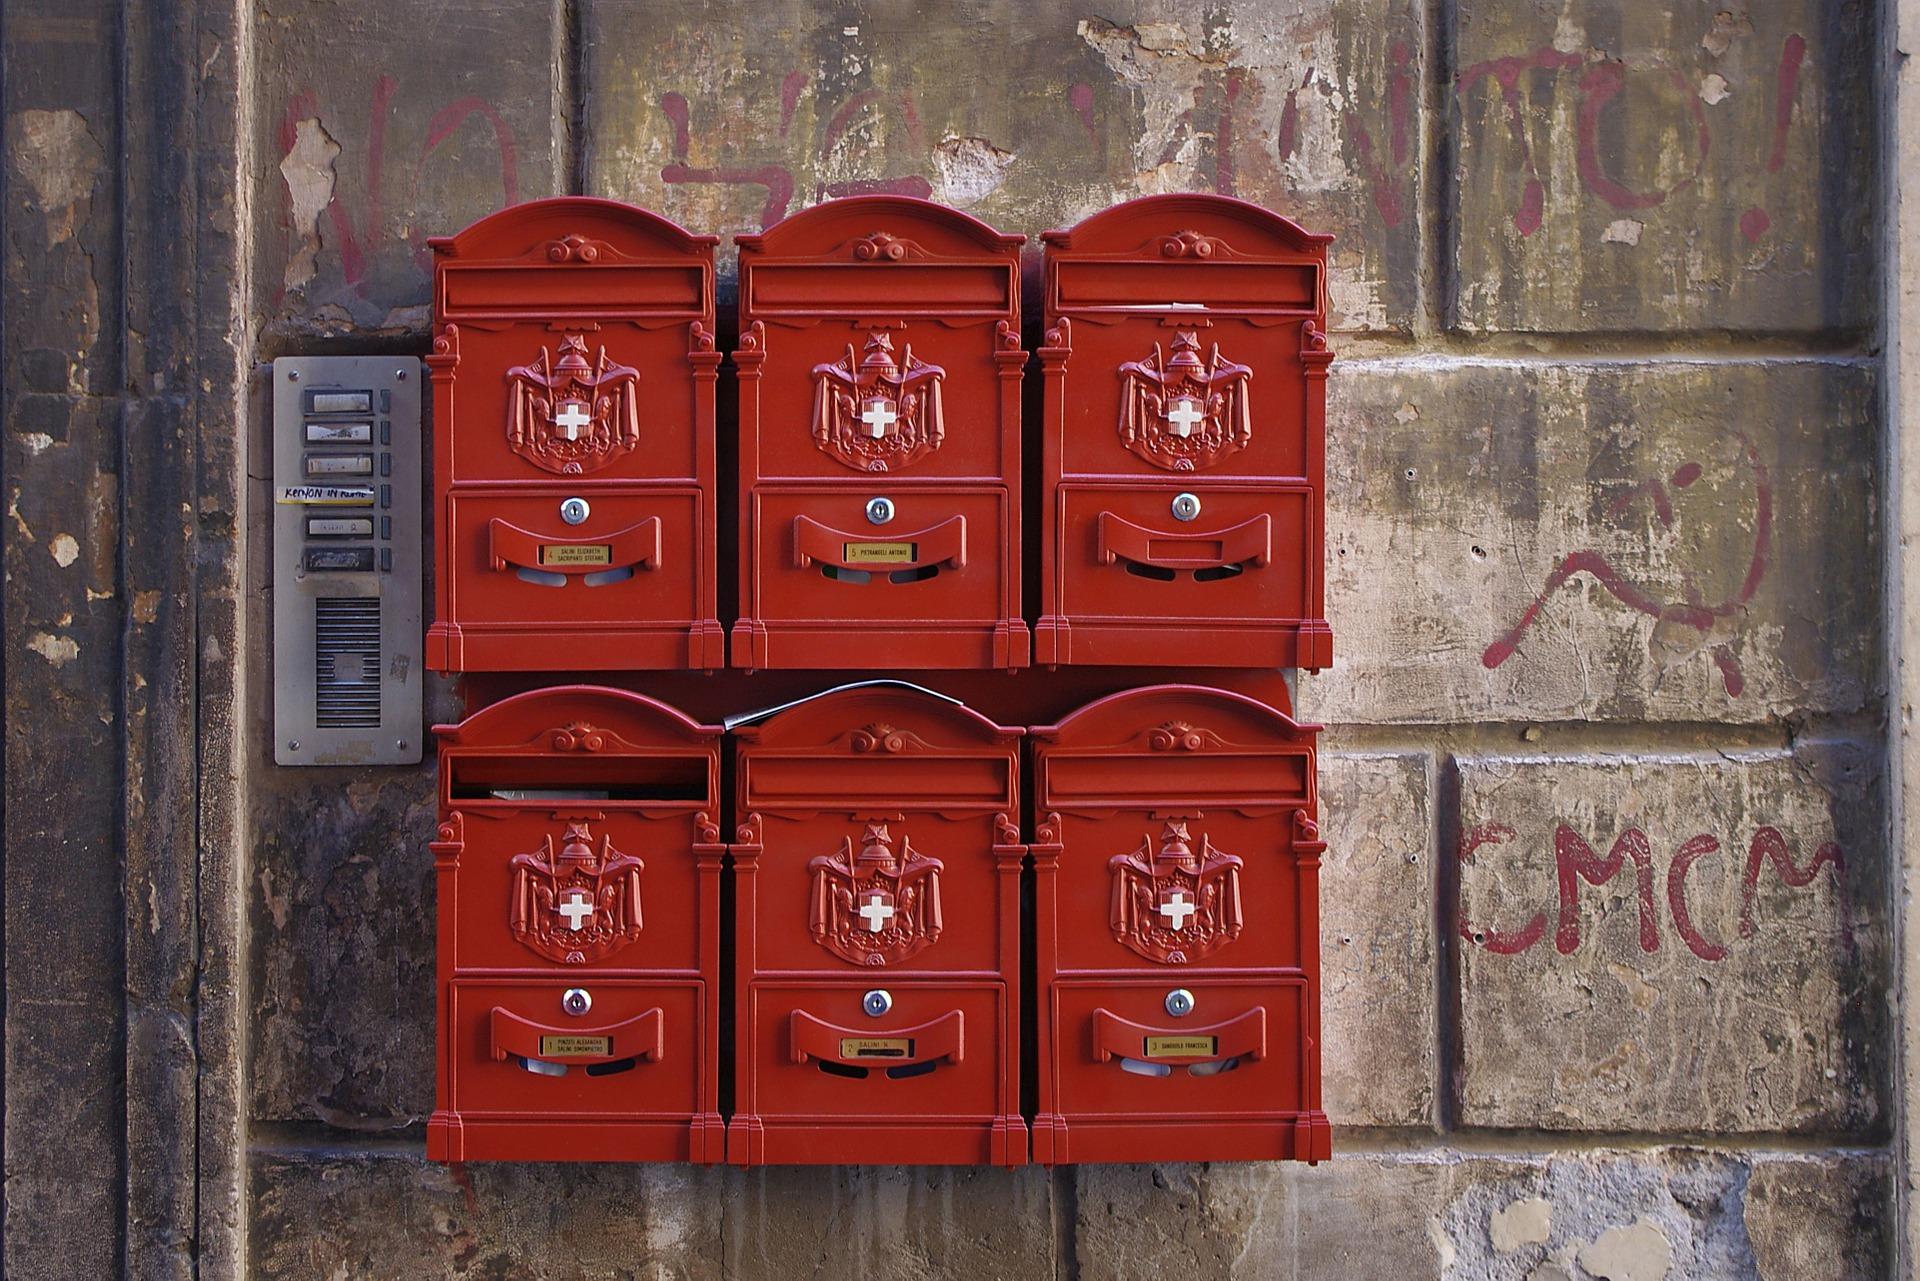 Mailbox by Blitzmaeker (source: Pixabay)